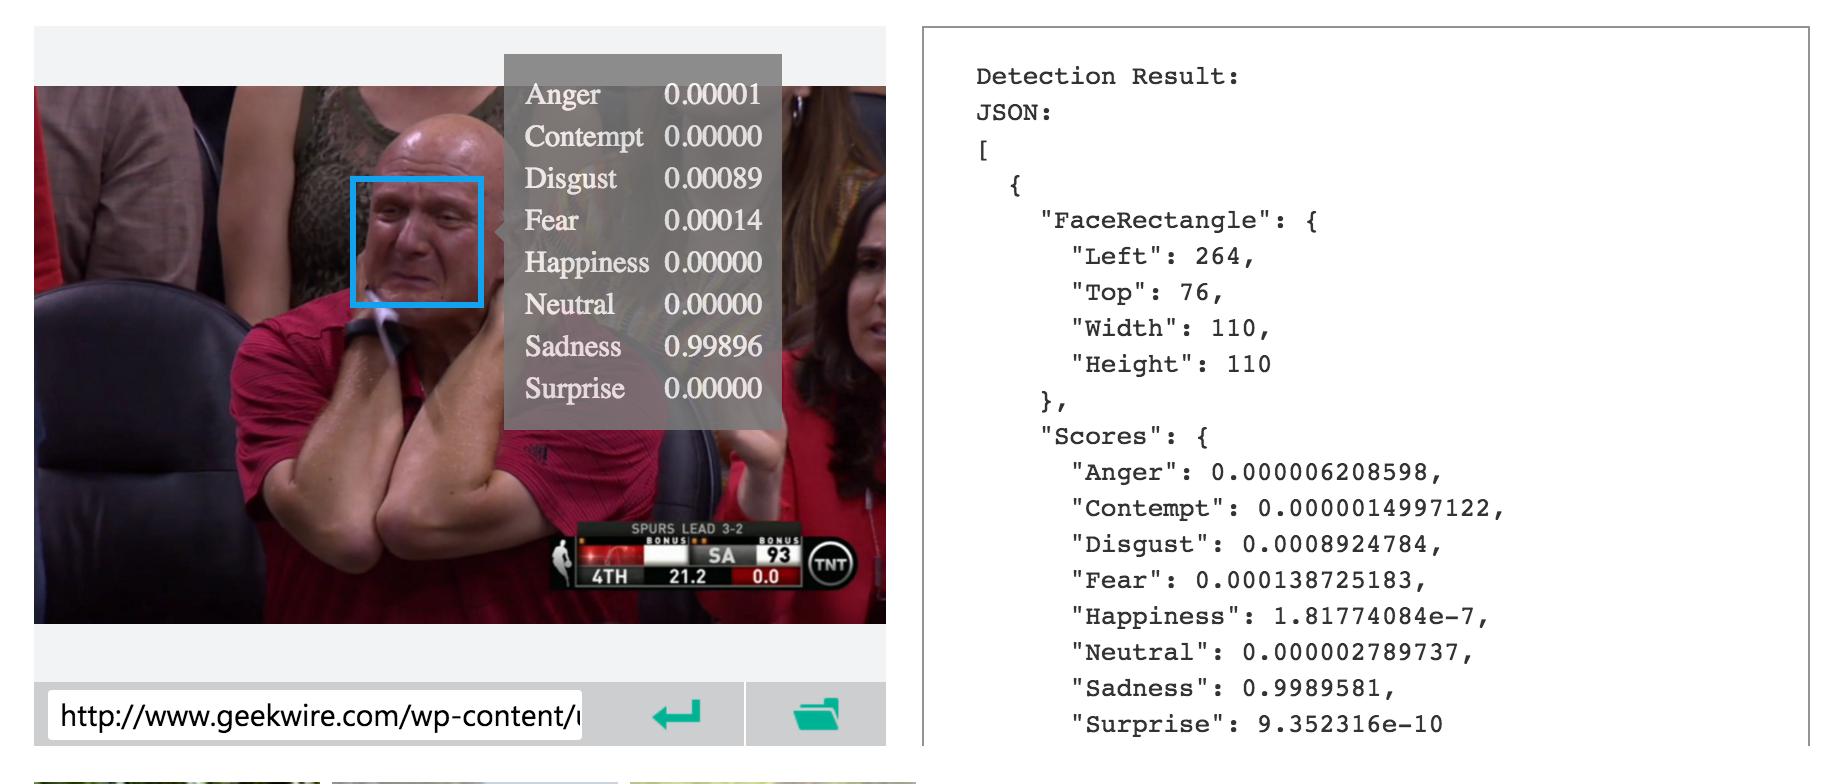 Microsoft's new emotion-sensing platform shows former CEO Steve Ballmer is 99 percent sad in this photo.